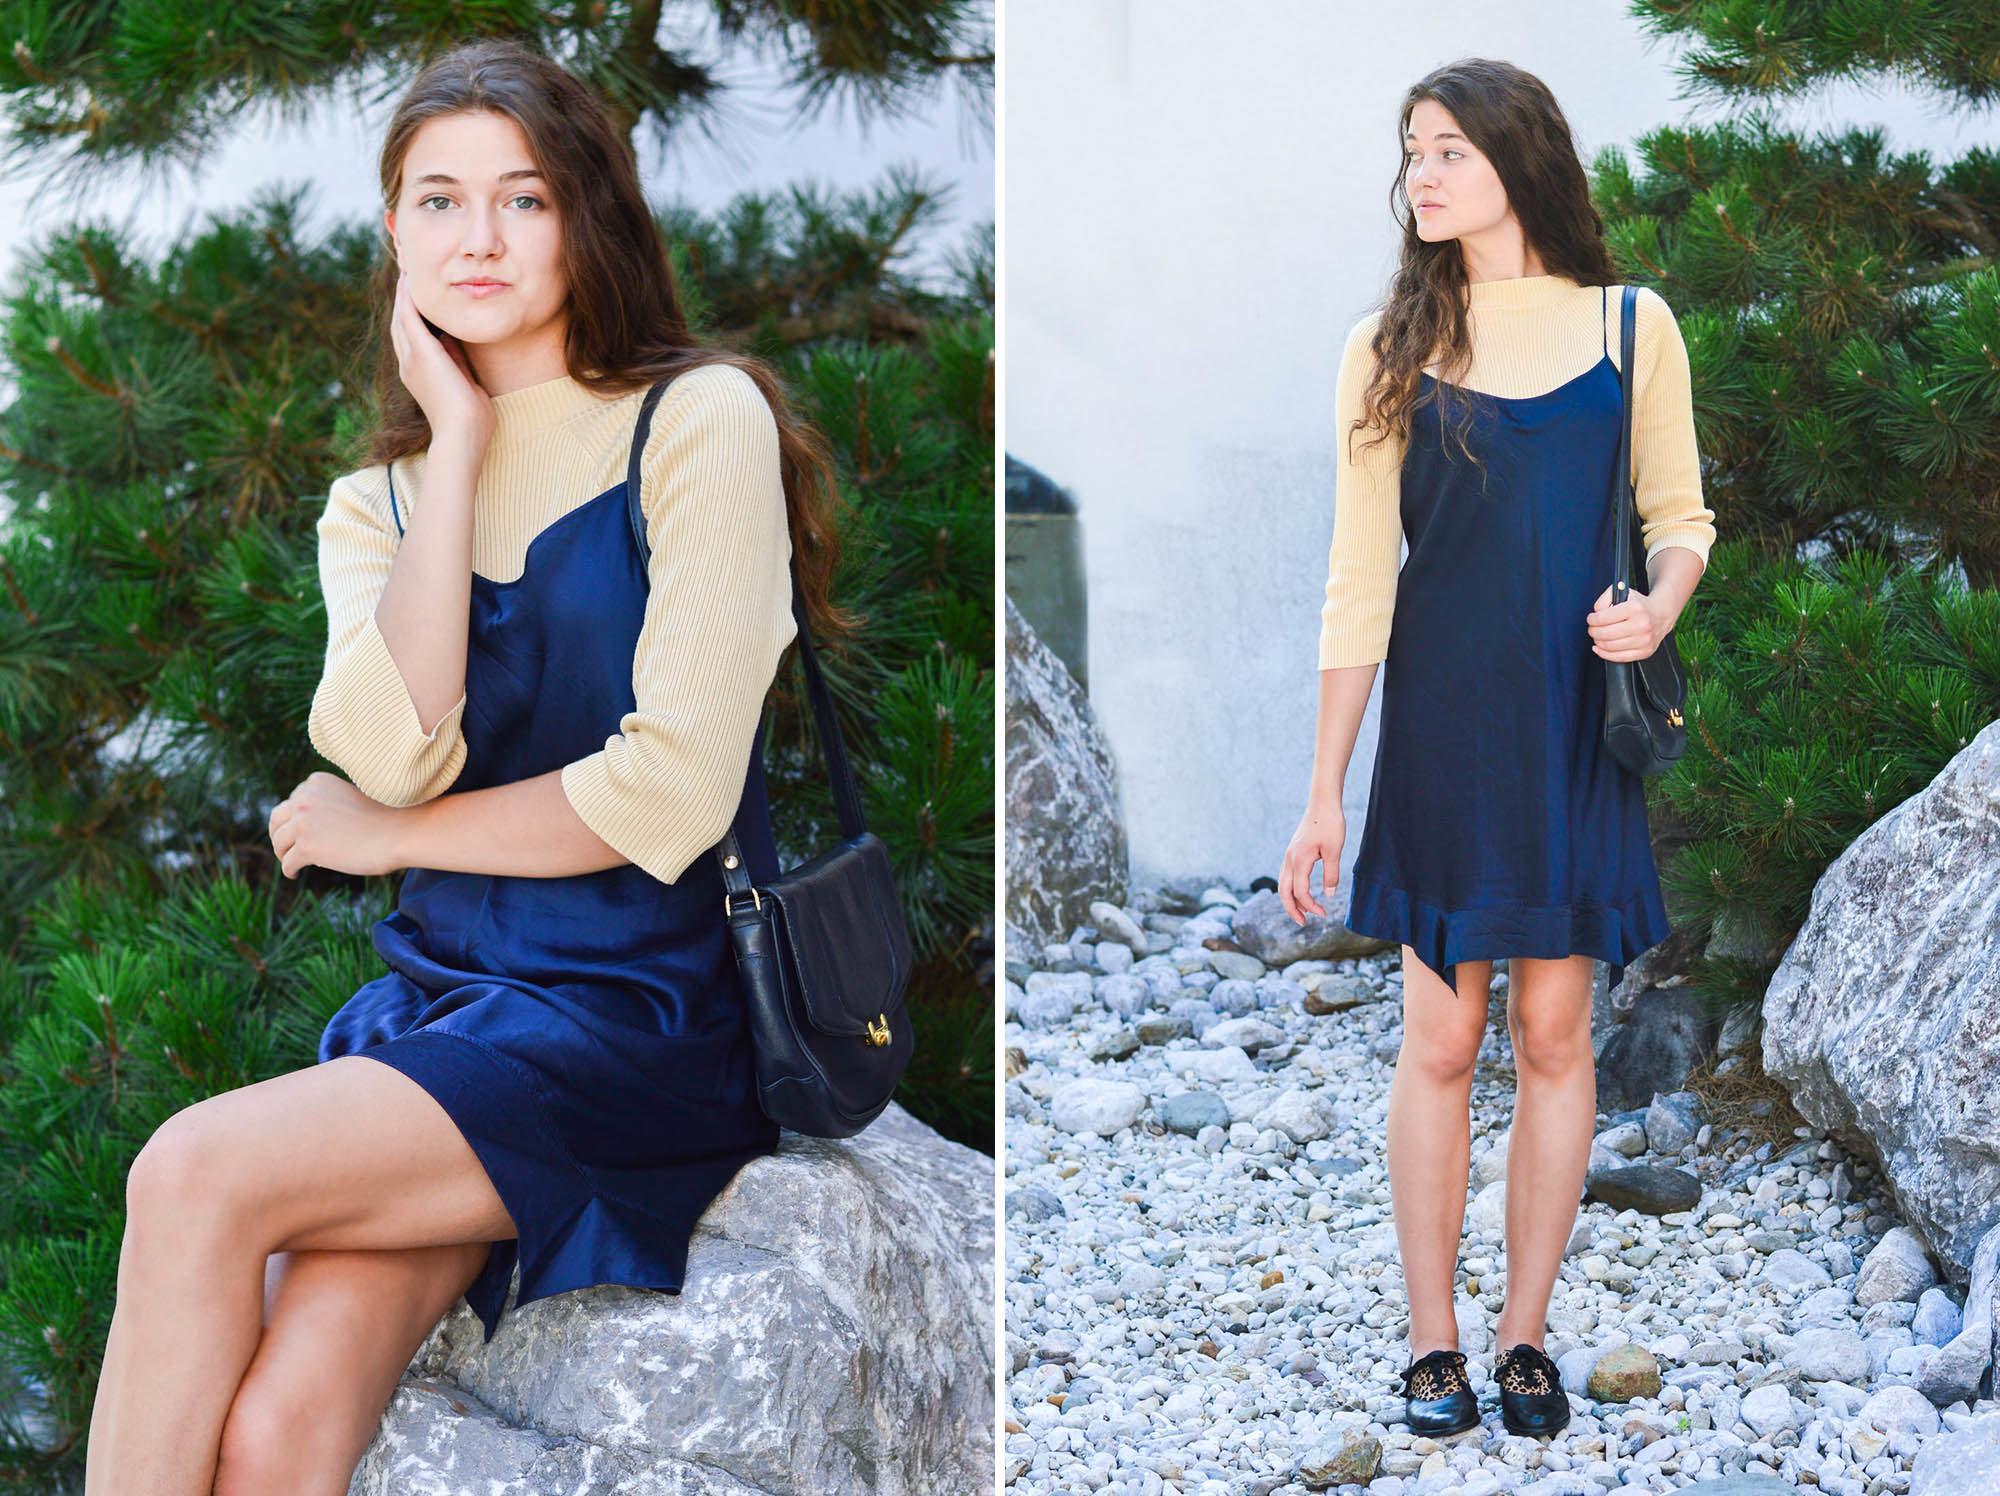 vintage slip dress casual everyday outfit dogdays of summer vintage onlineshop graz